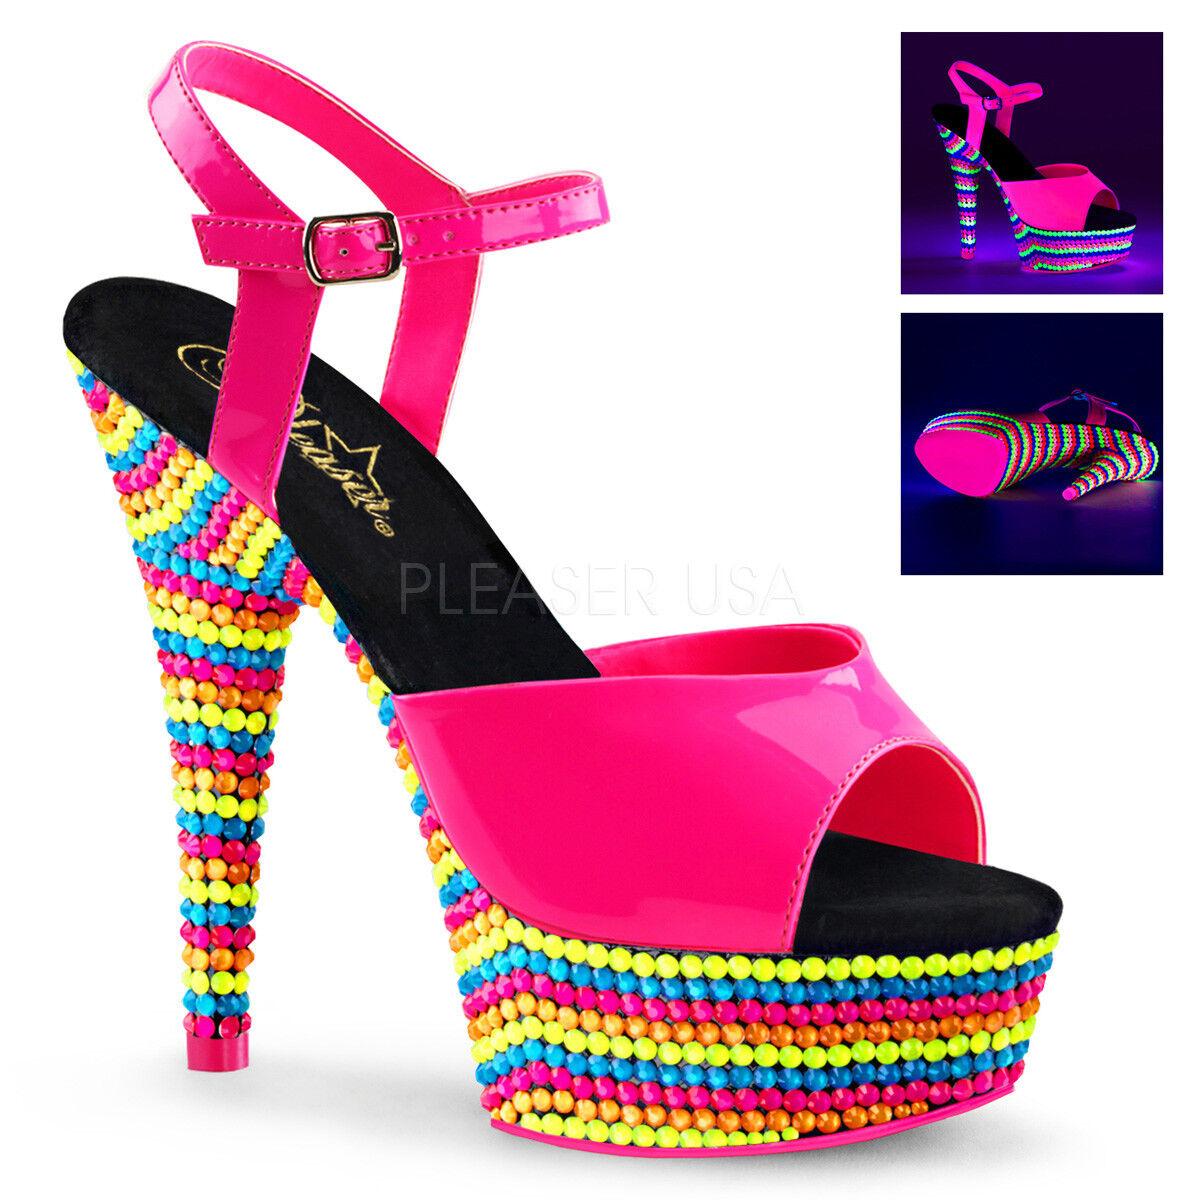 Pleaser DELIGHT-609RBS Neon UV rose Platform Ankle Strap Sandal Multi Couleur Bead